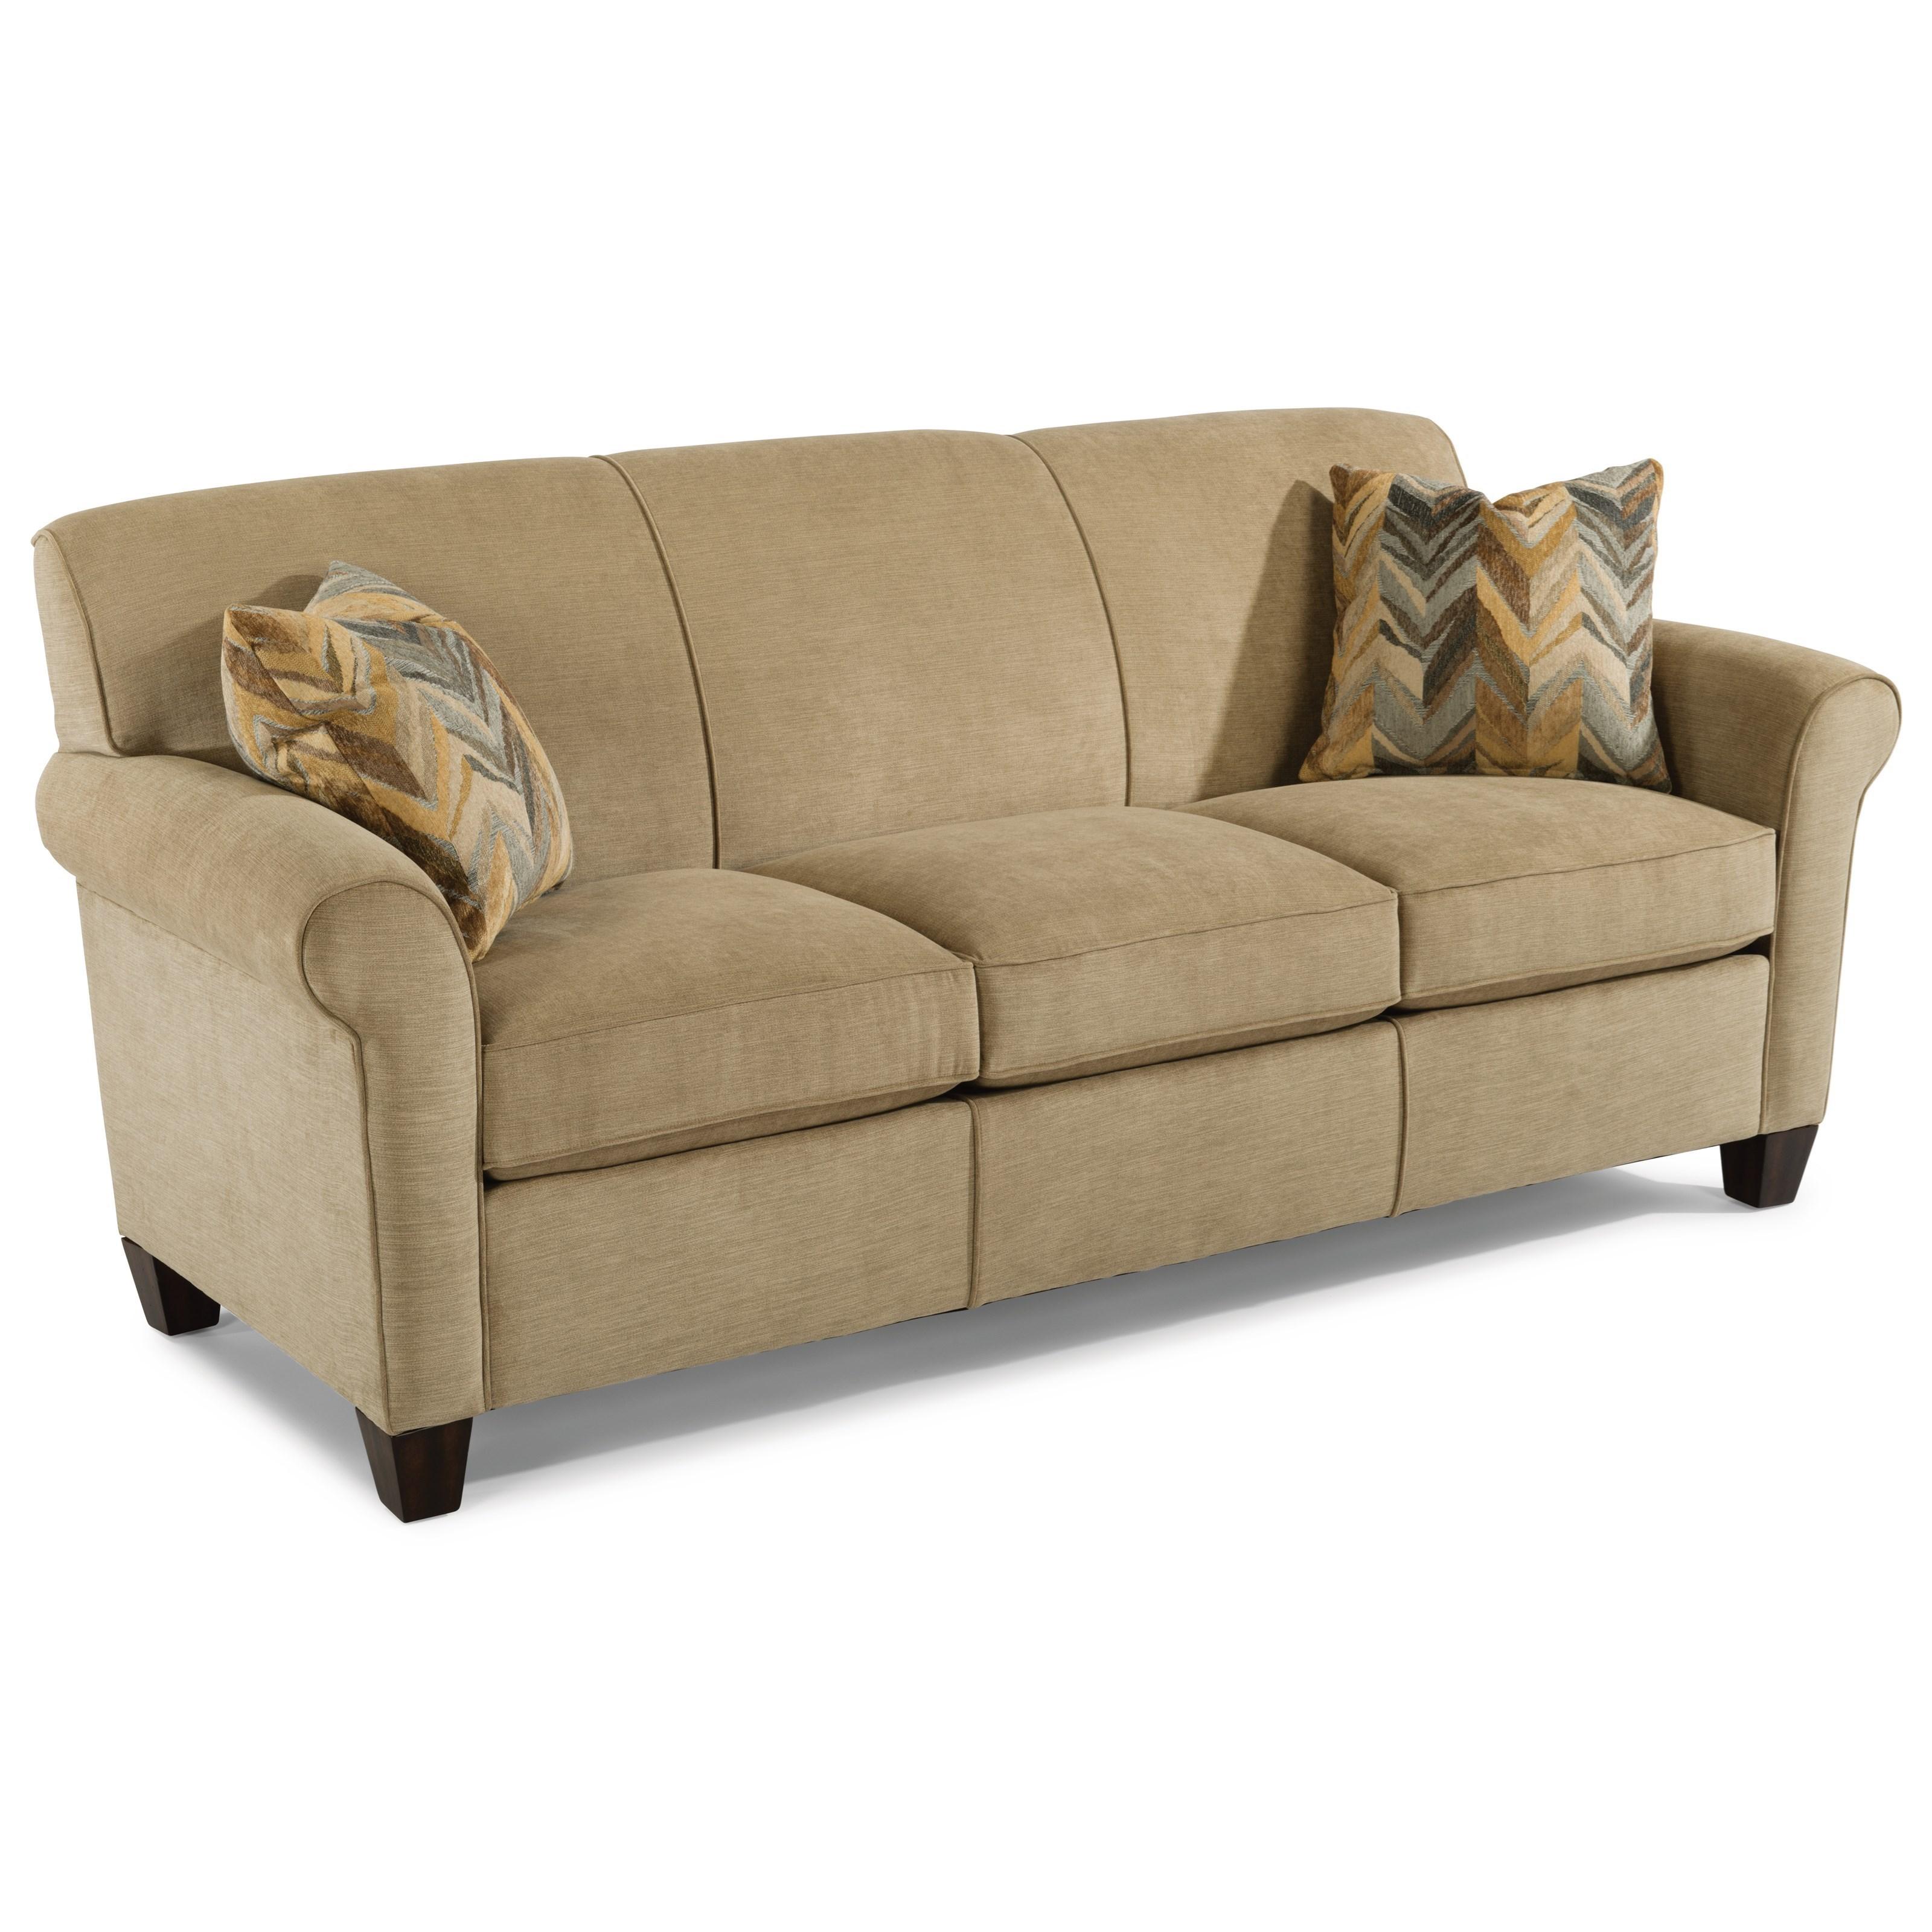 Dana Stationary Sofa by Flexsteel at Furniture Barn